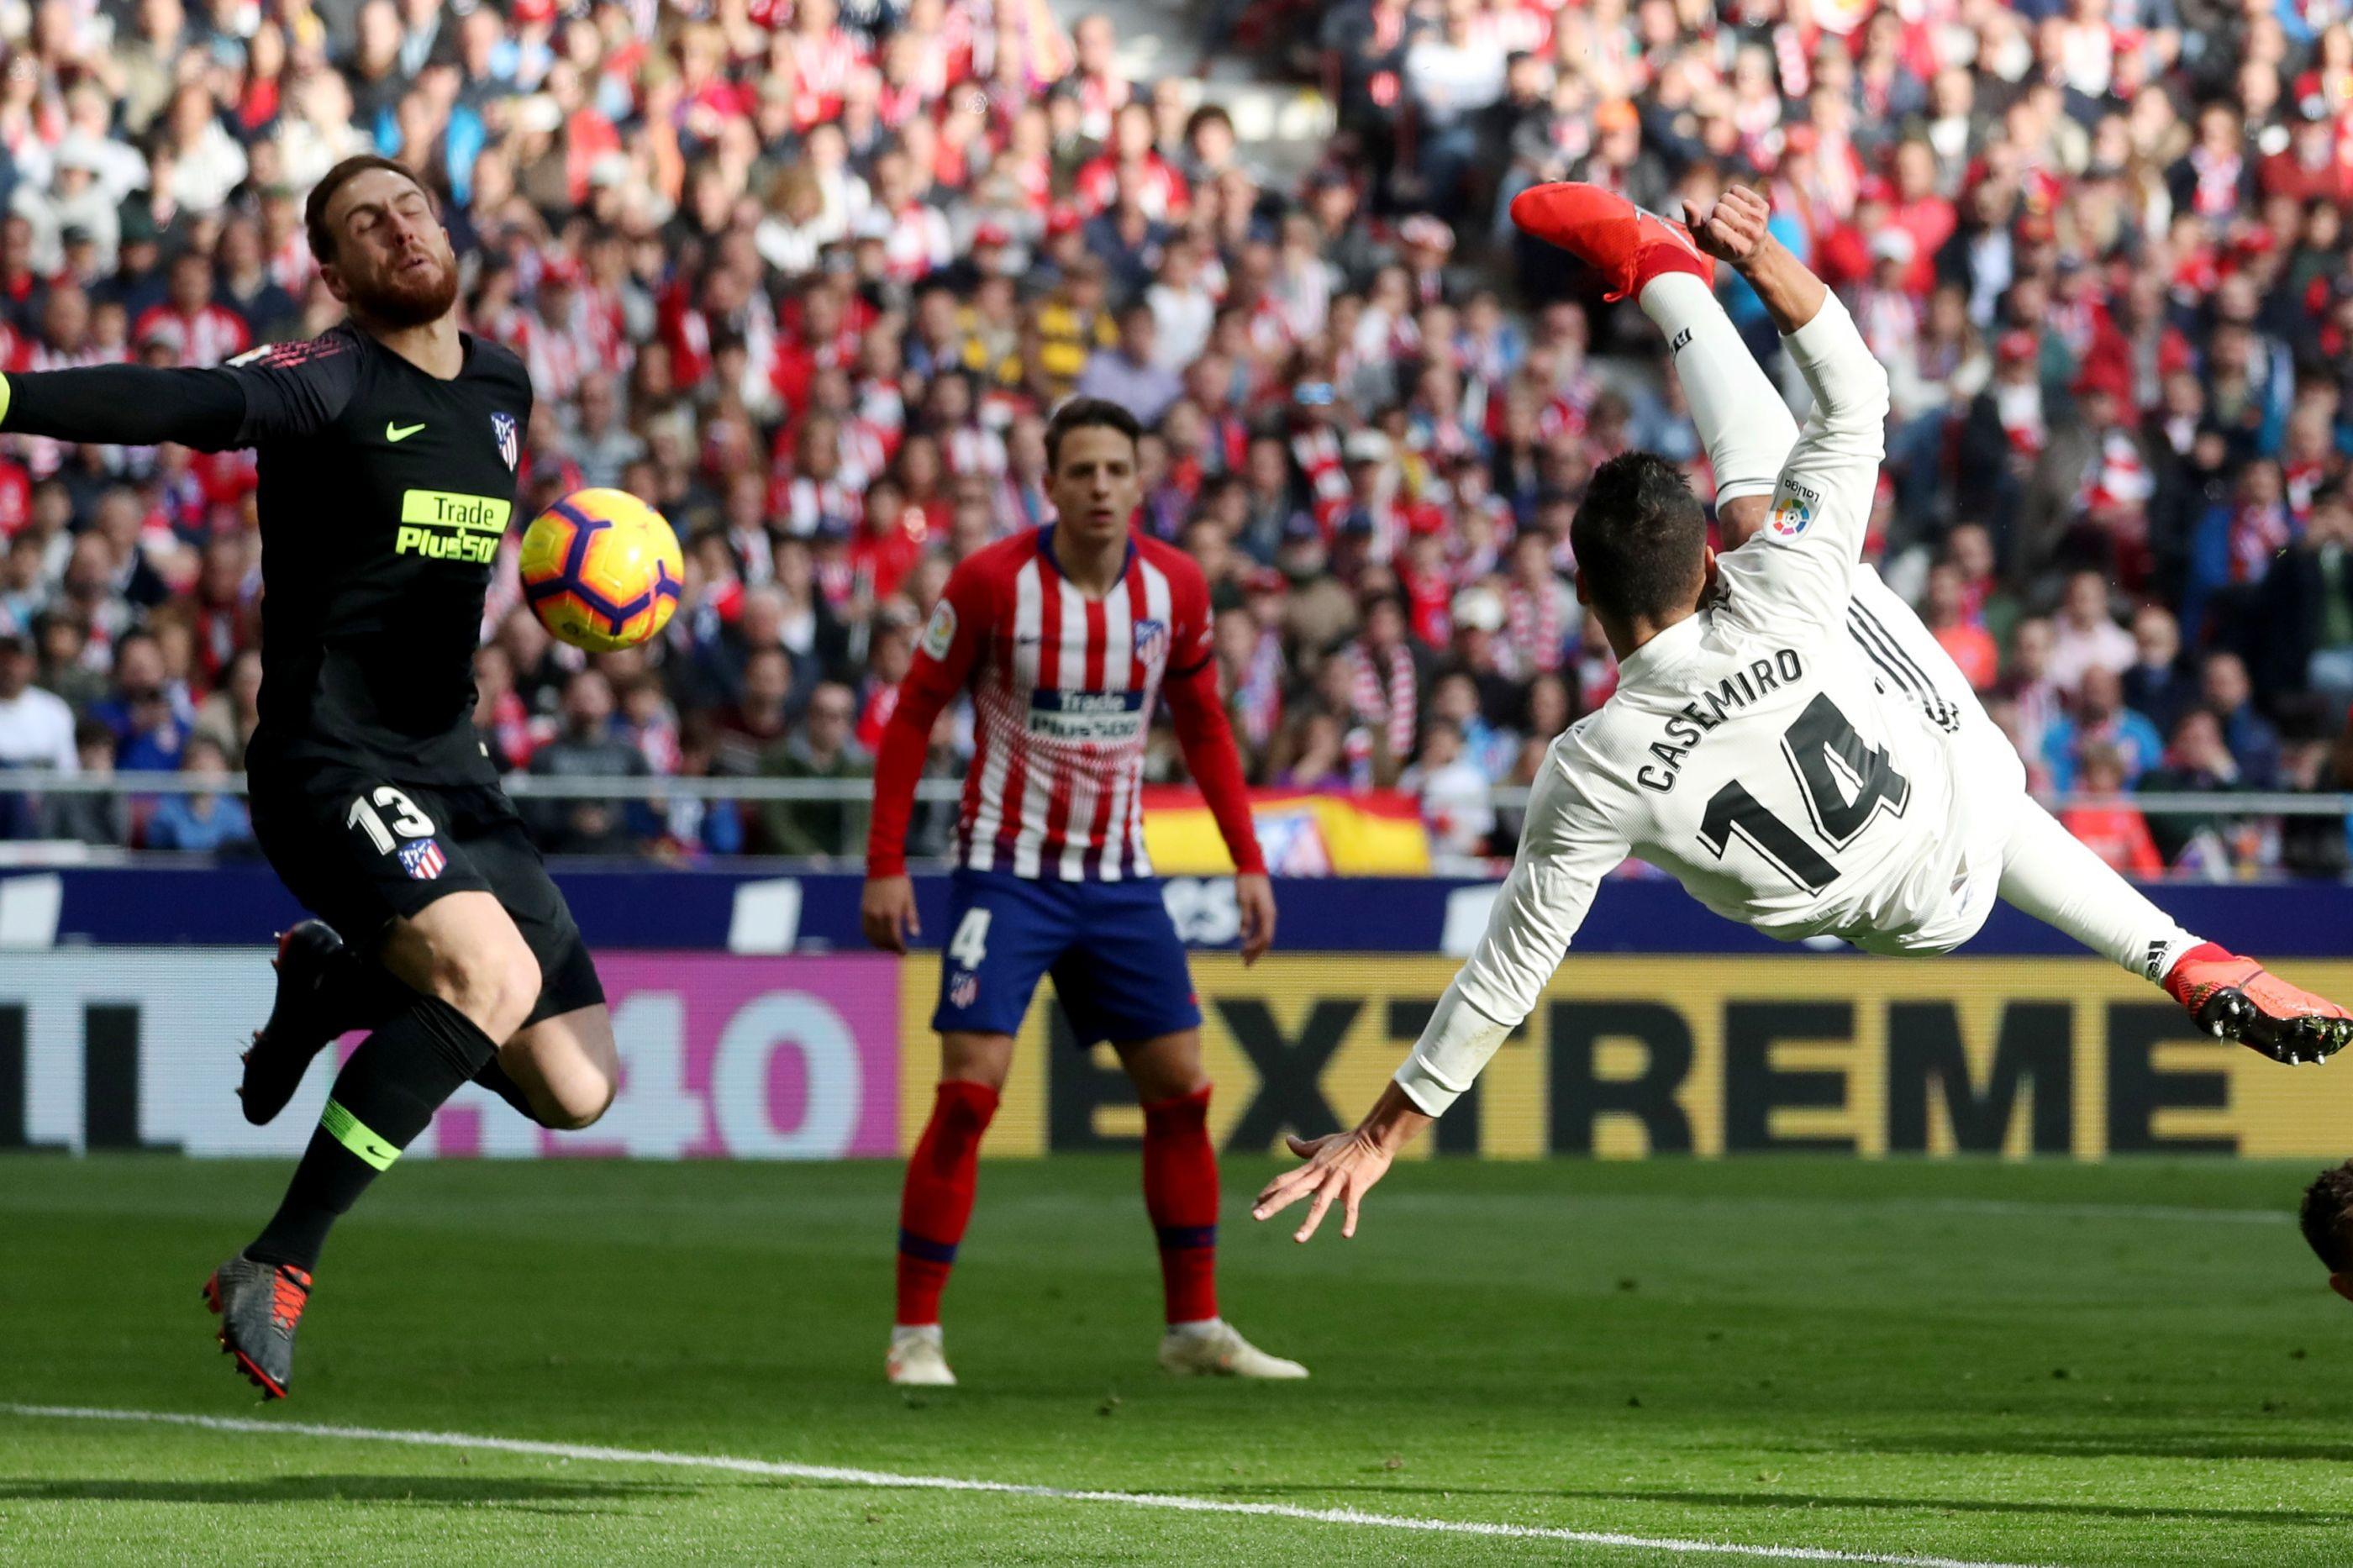 Real vence dérbi de Madrid e ultrapassa Atlético na tabela classificativa